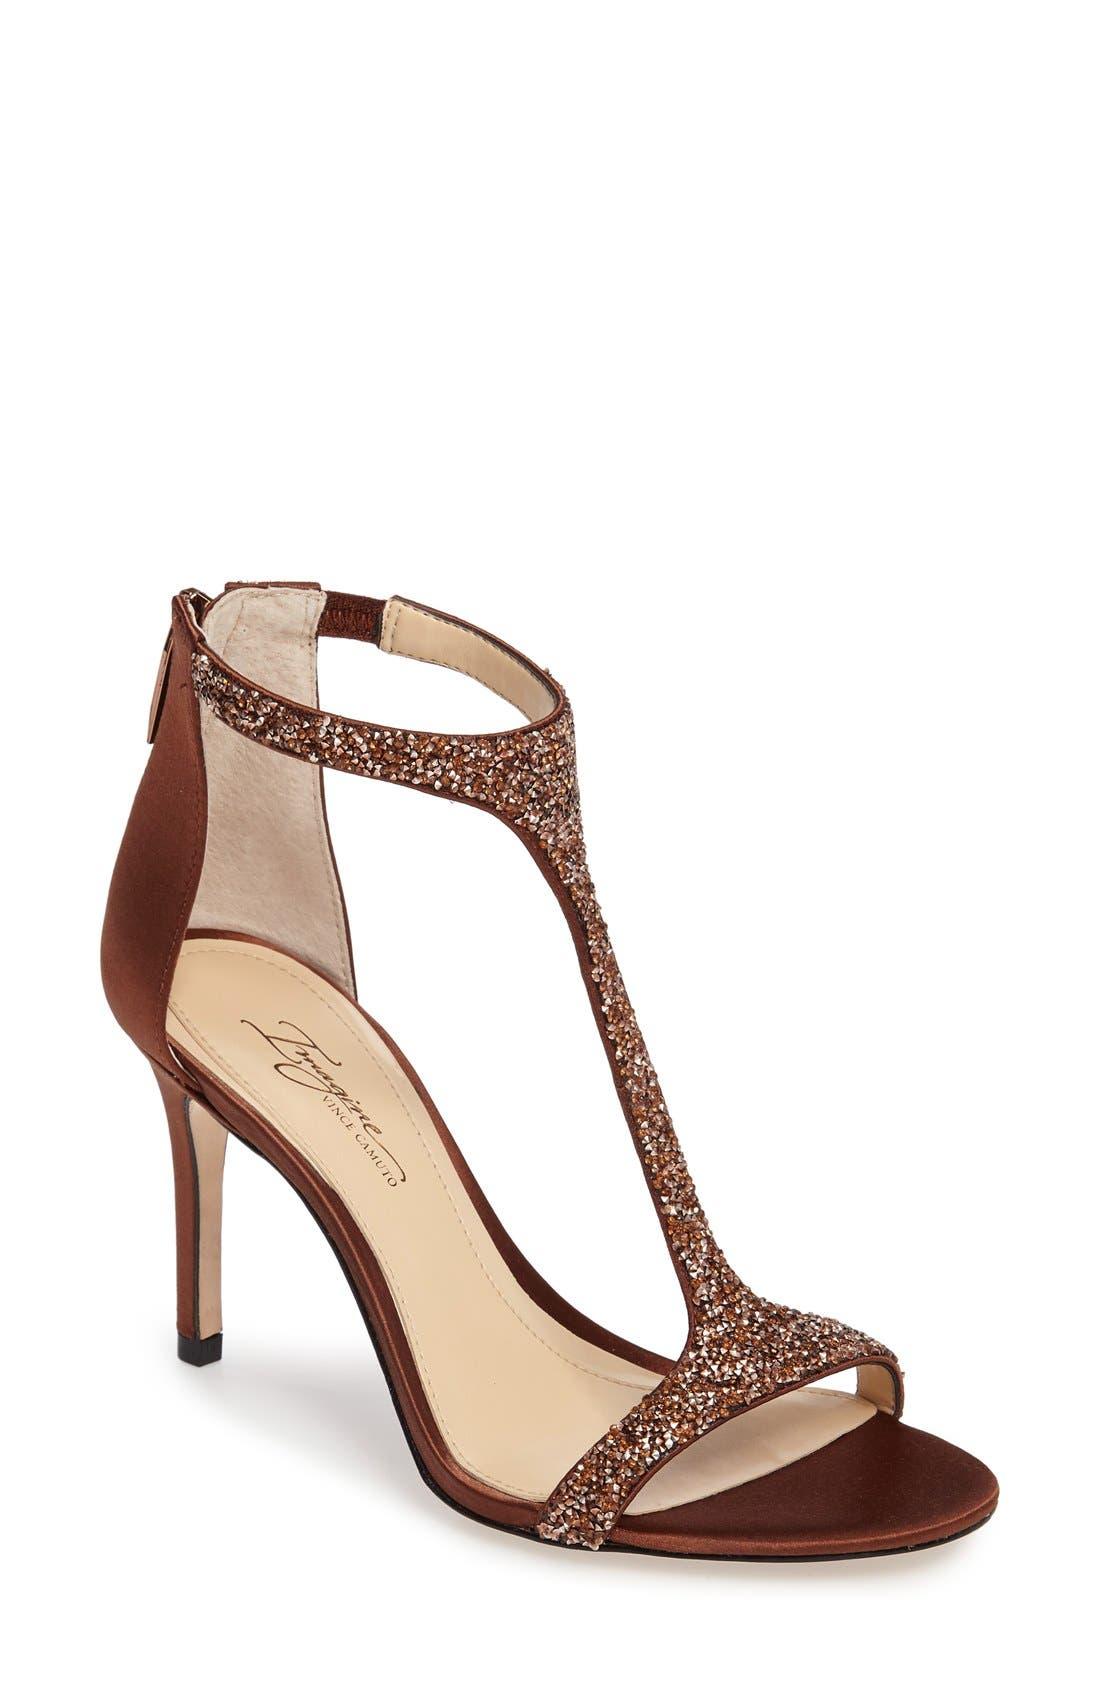 Imagine by Vince Camuto 'Phoebe' Embellished T-Strap Sandal (Women)